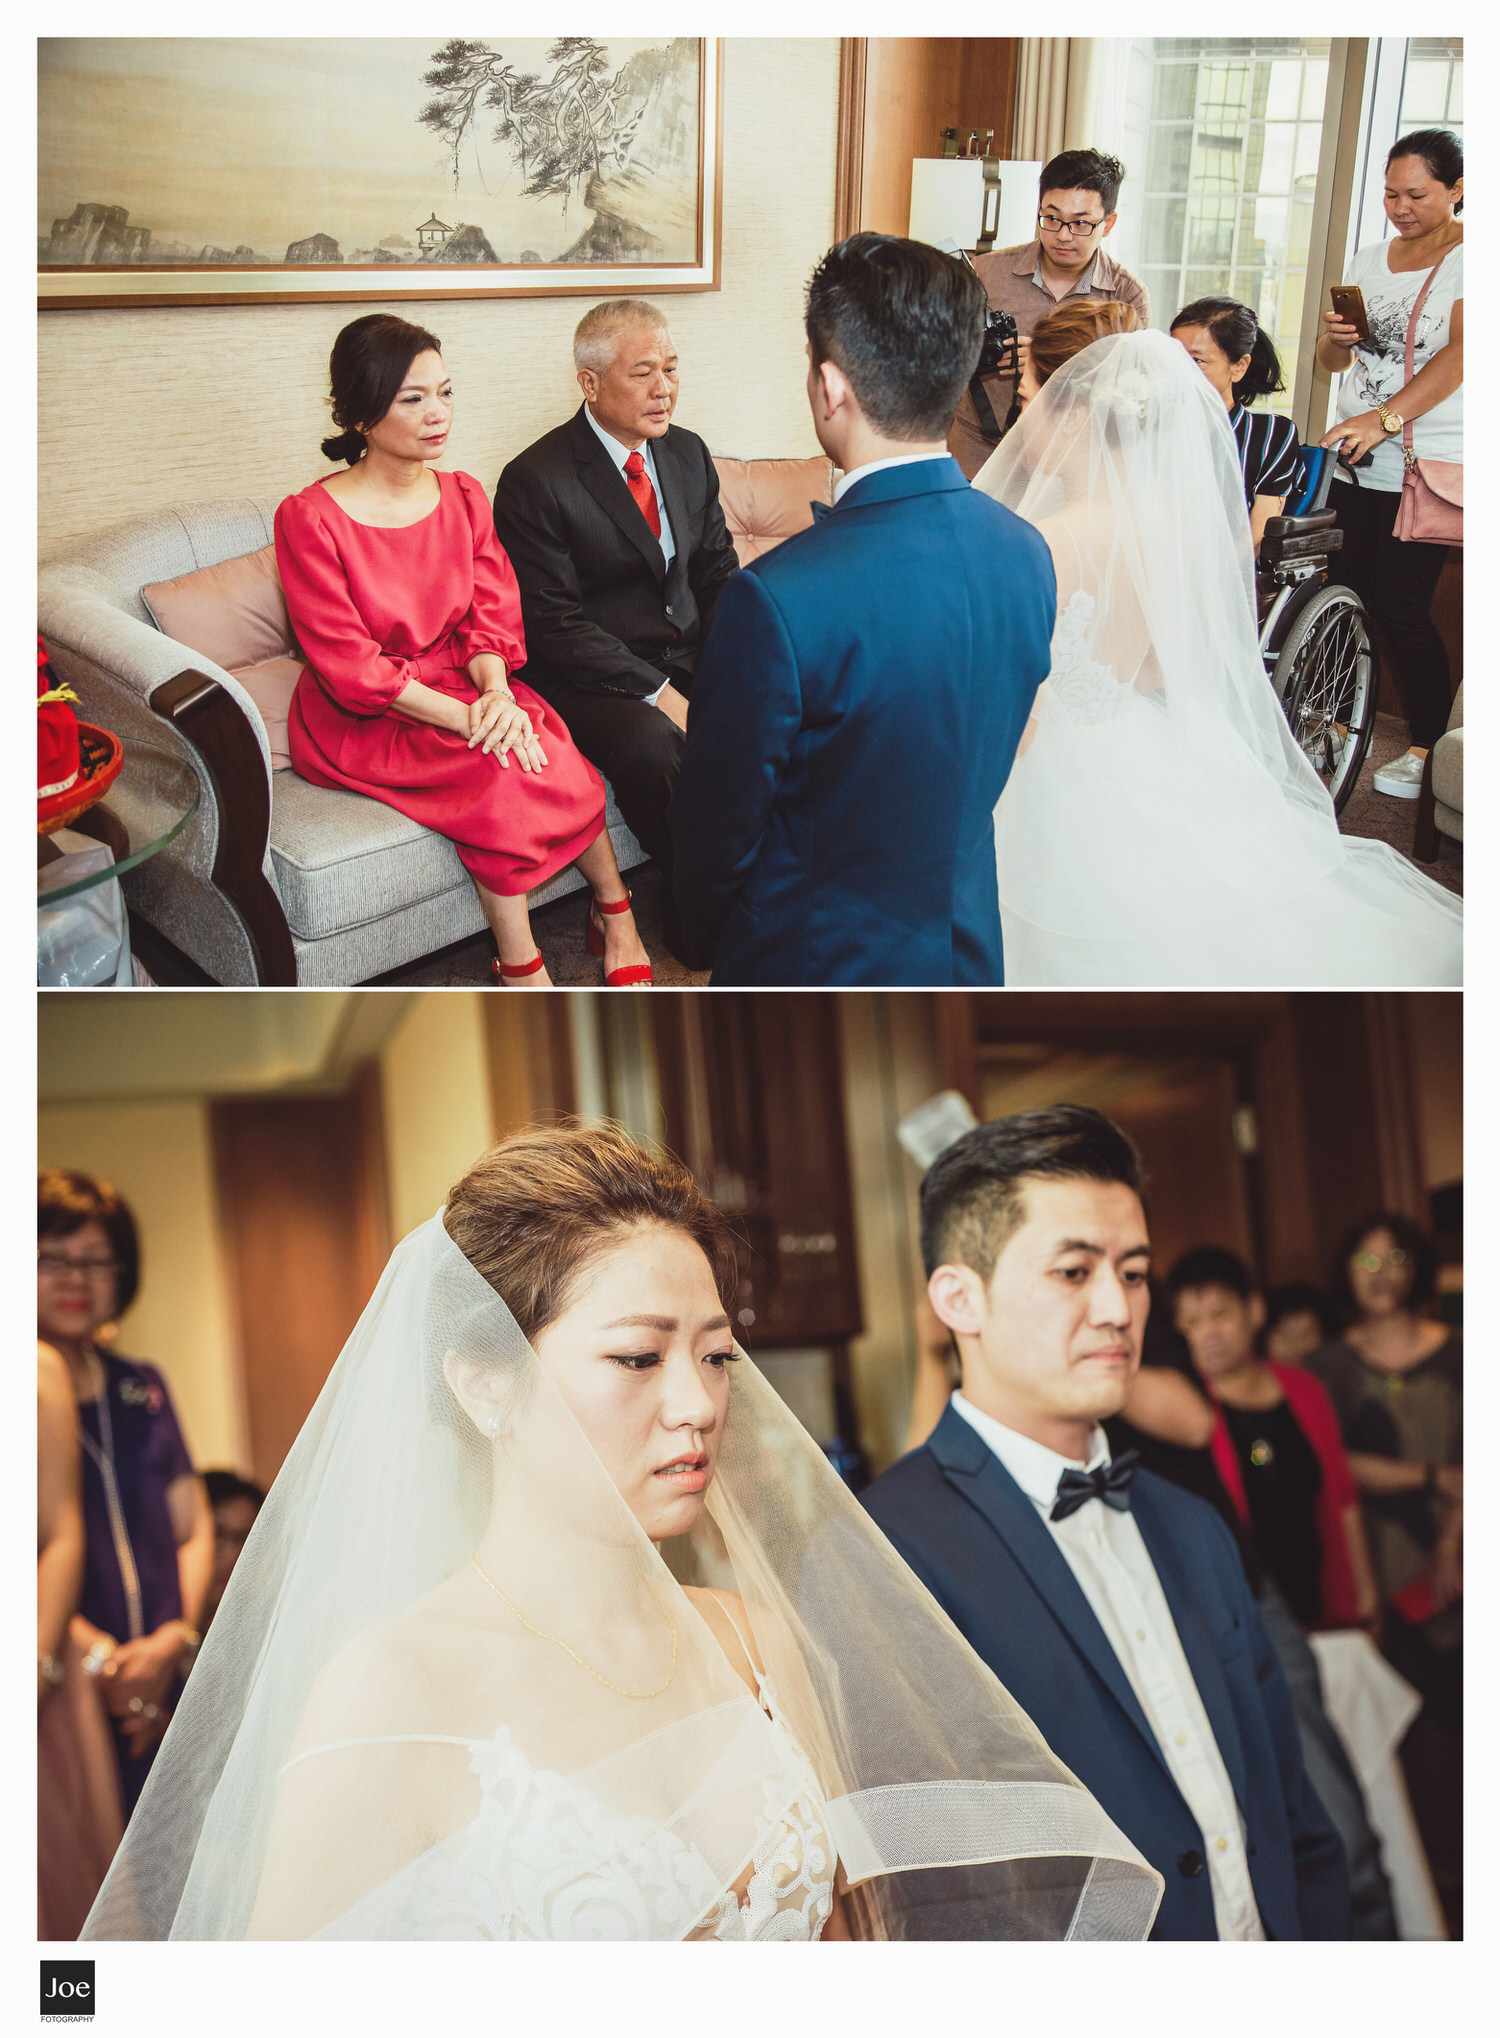 wedding-photography-shangri-la-far-eastern-plaza-hotel-ariel-sam-joe-fotography-070.jpg